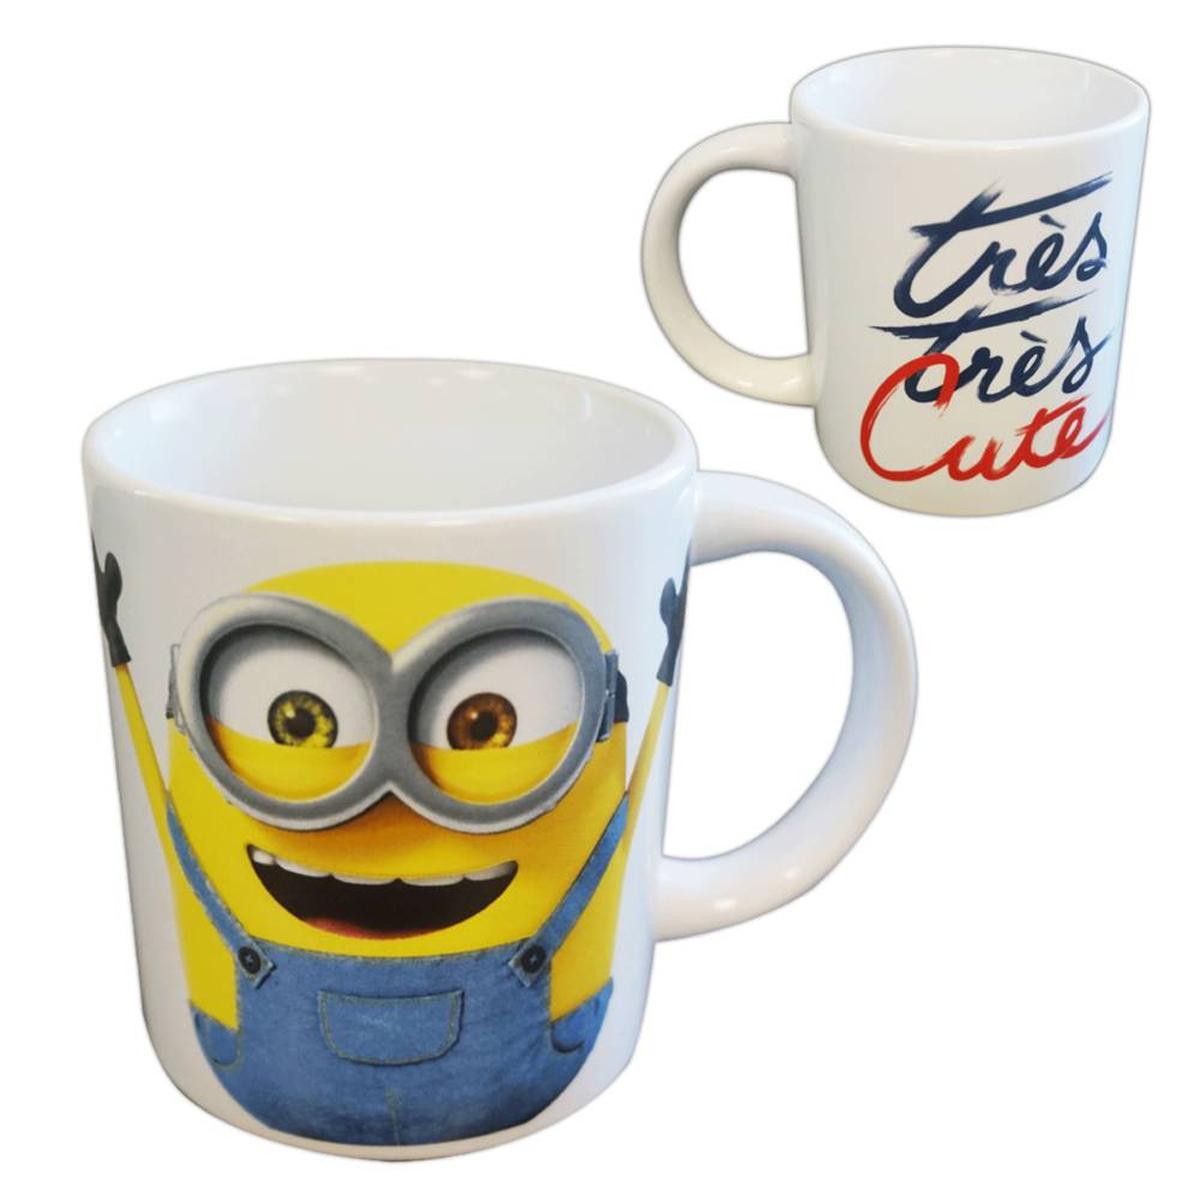 Petit mug céramique \'Minions\' (très très cute) - 85x75 mm - [A3278]